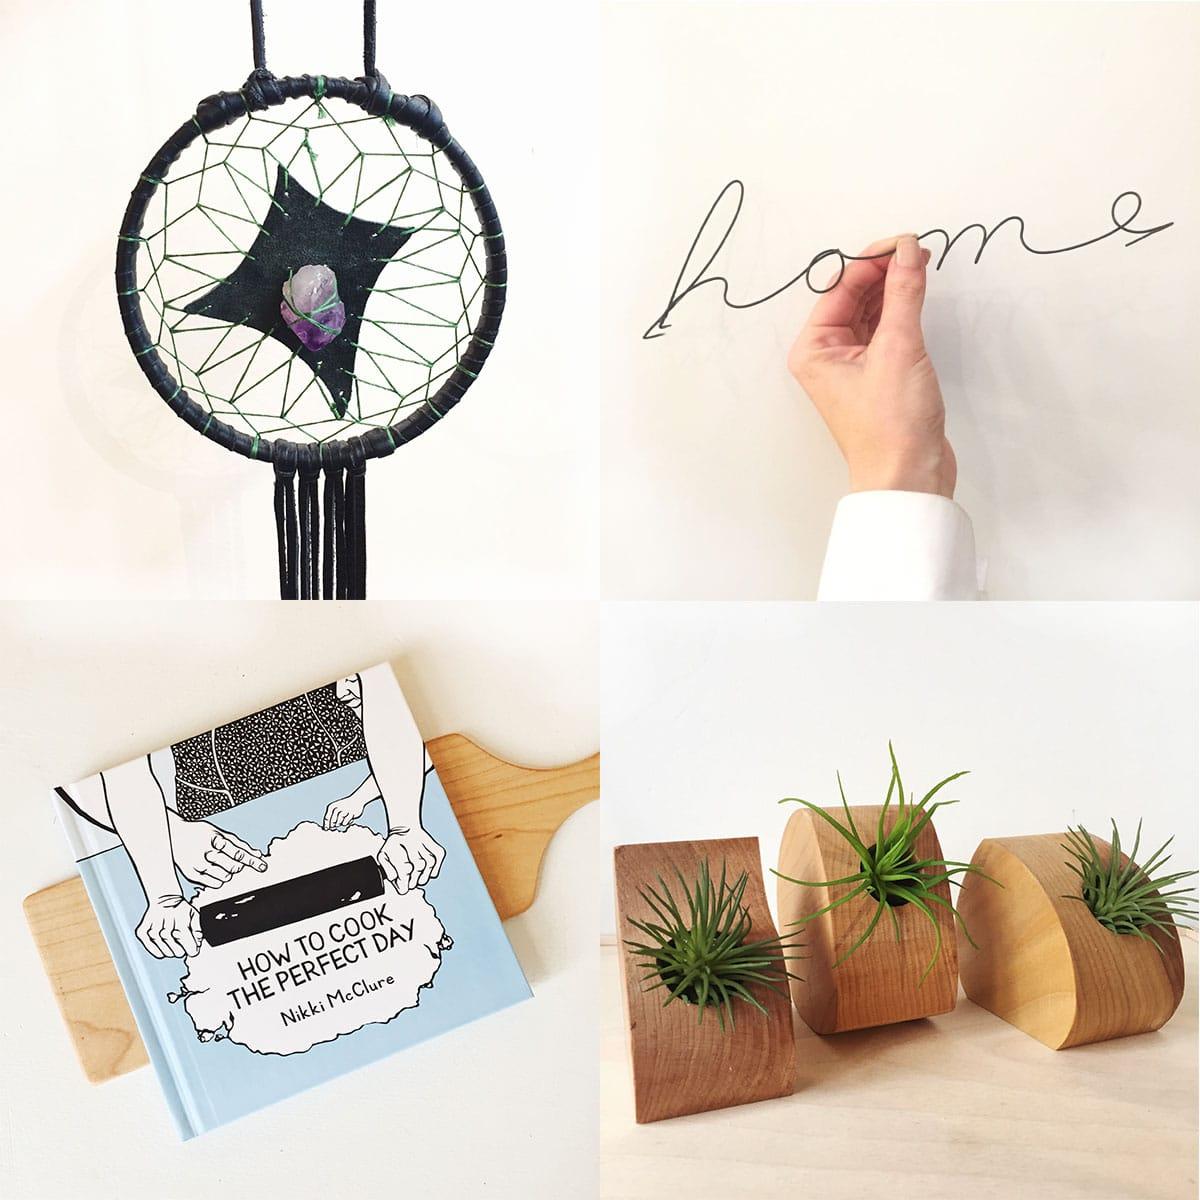 Handmade accessories for the home at Homespun: Modern Handmade